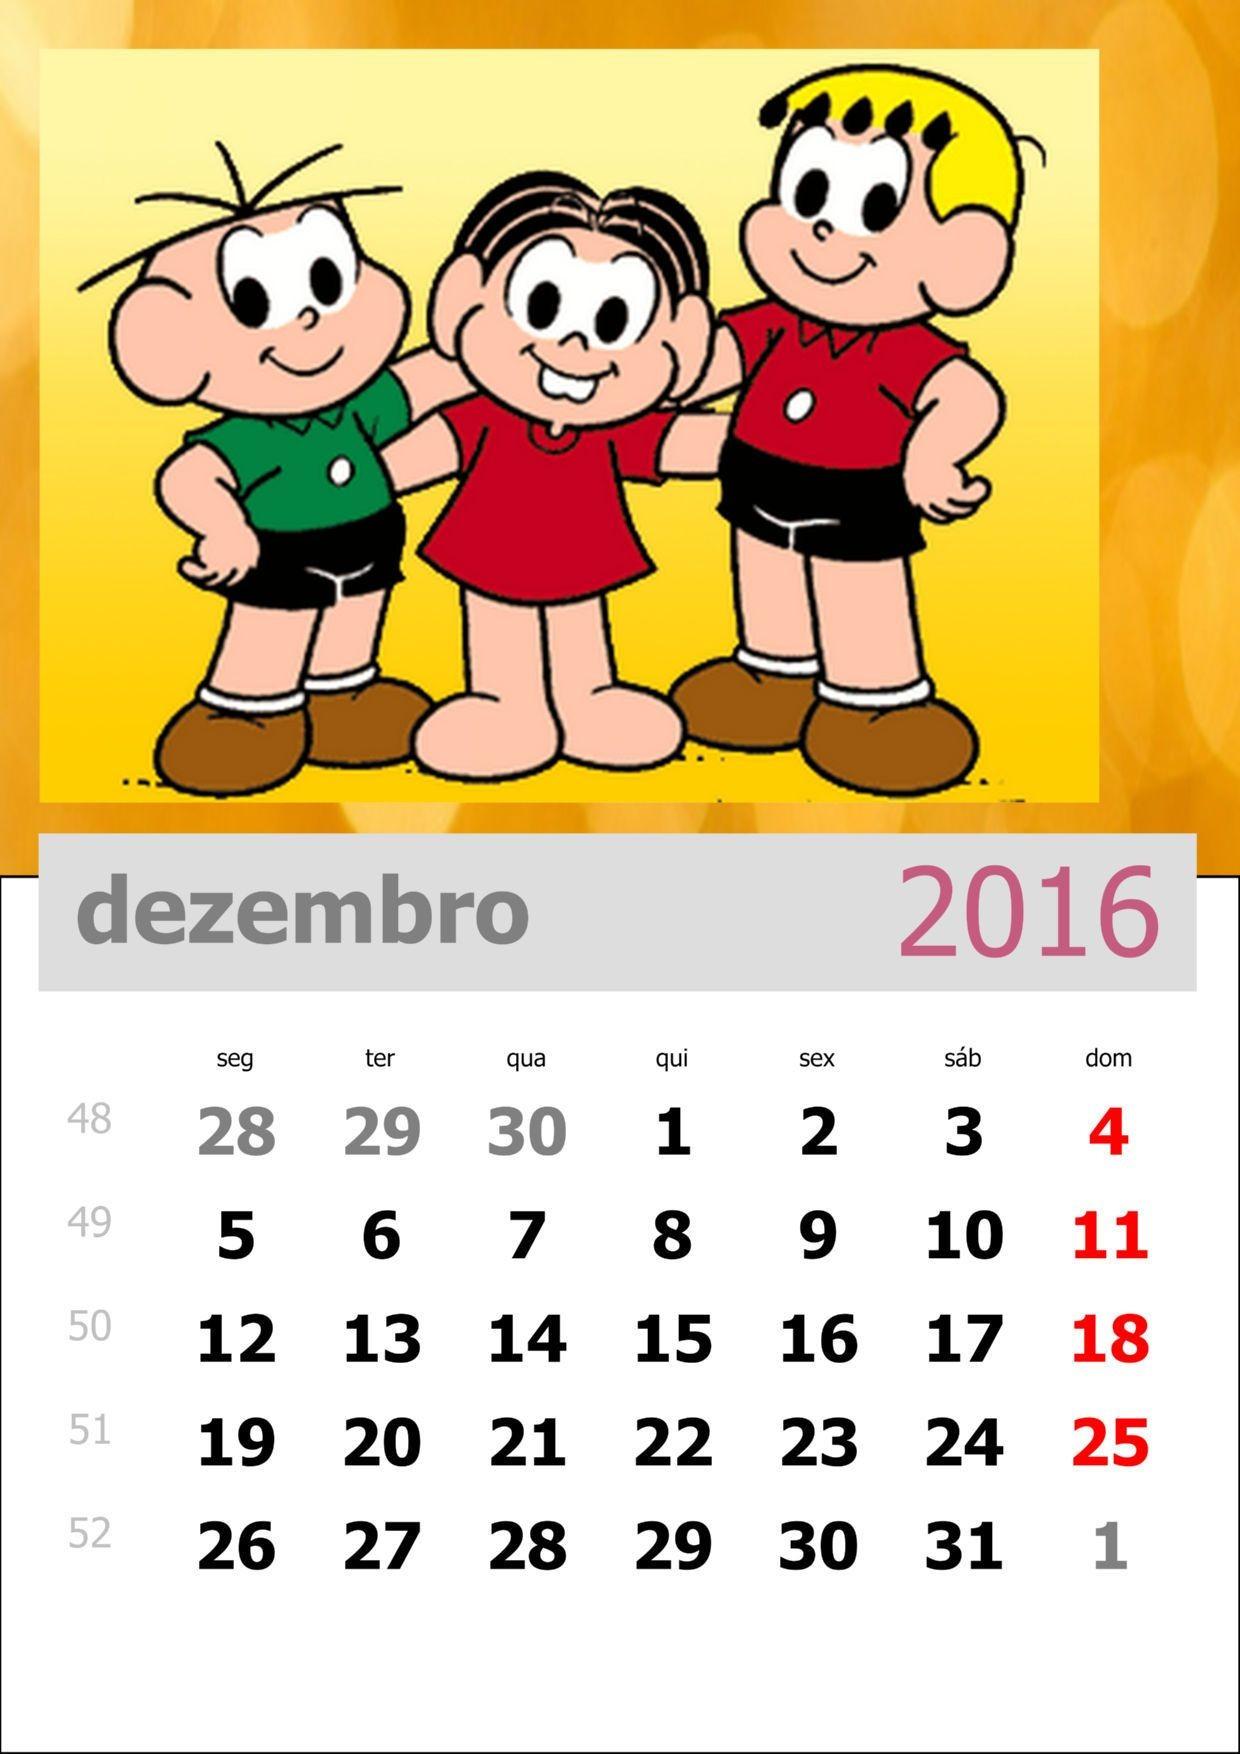 Calendario De Outubro 2017 Para Imprimir Más Caliente Clau Claudirenemanzo On Pinterest Of Calendario De Outubro 2017 Para Imprimir Más Caliente Pin De Flora Las Em Printable Pinterest